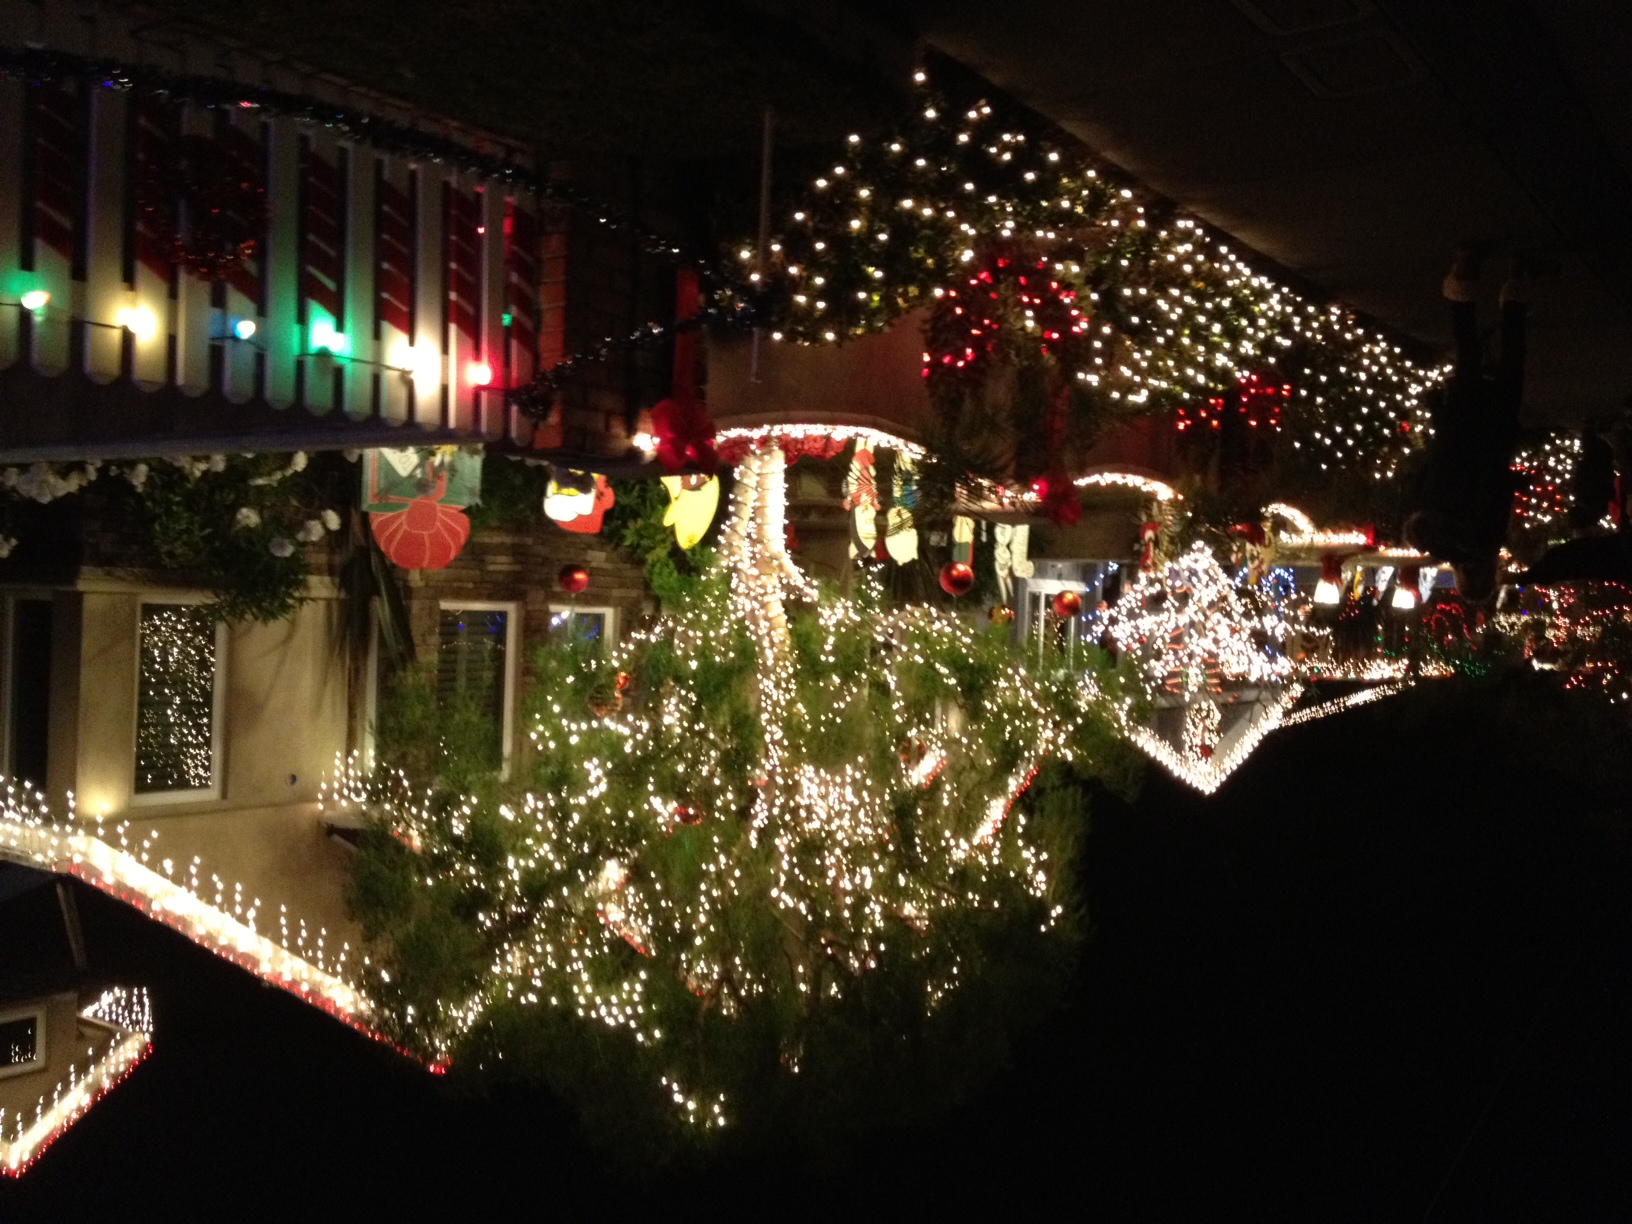 Christmas at candy cane lane el segundo jim kinmartin cpcu